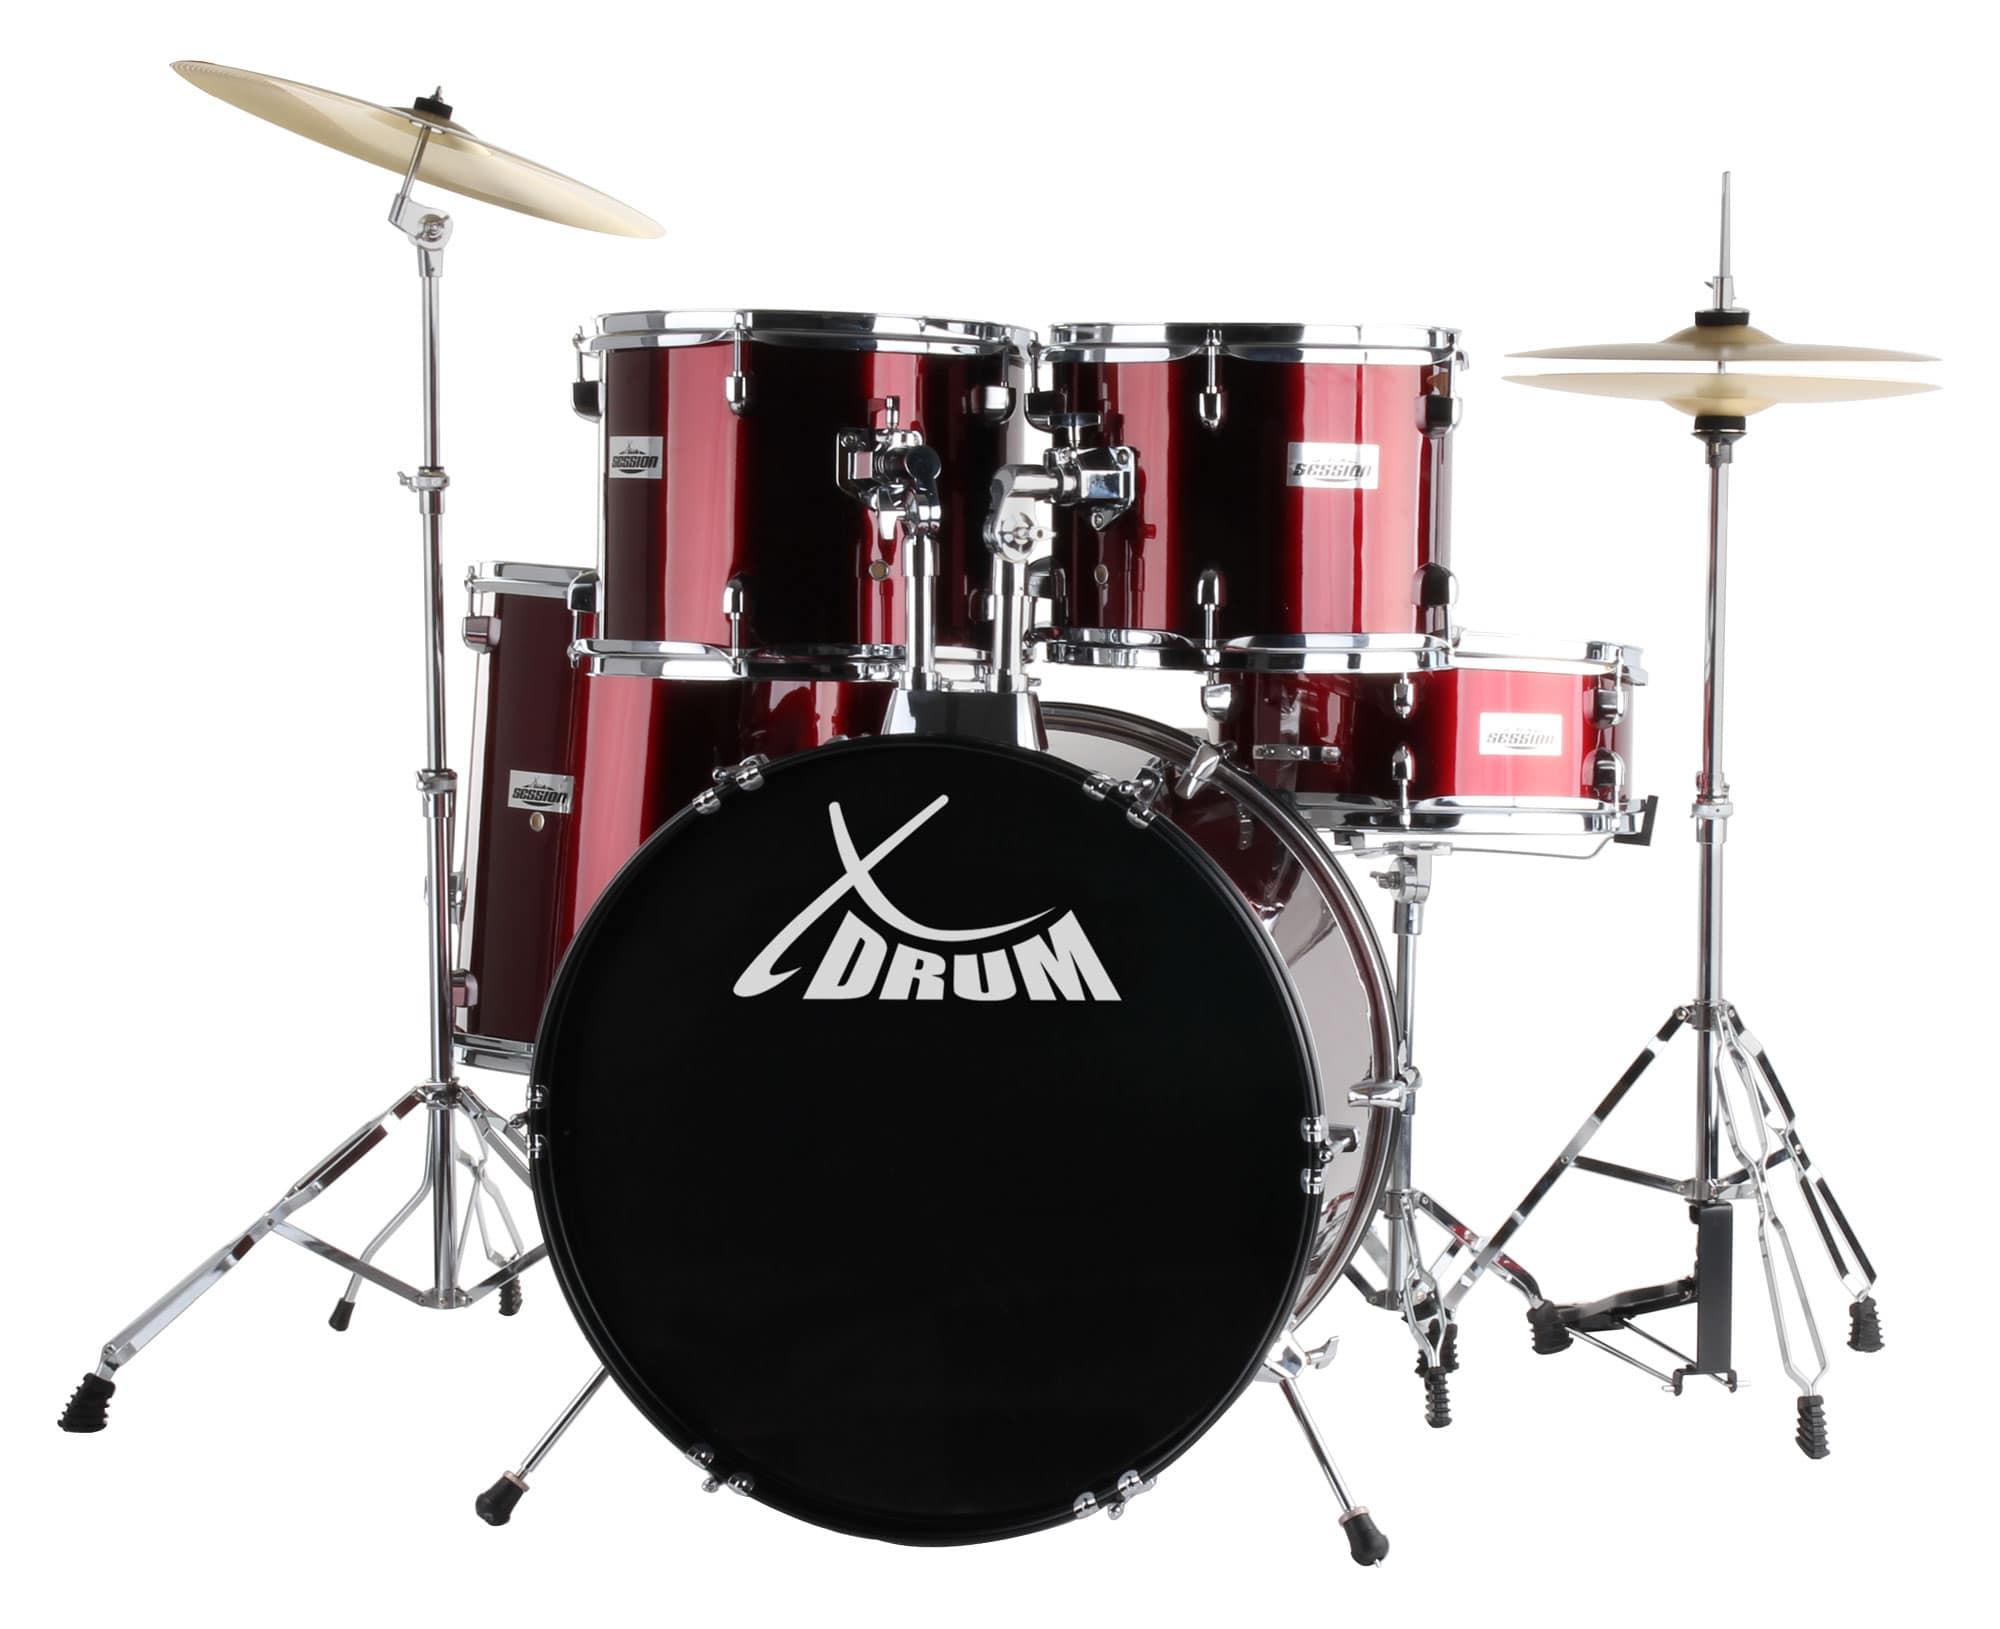 XDrum Semi 20' Studio Schlagzeug Komplettset Rot inkl. Schule DVD